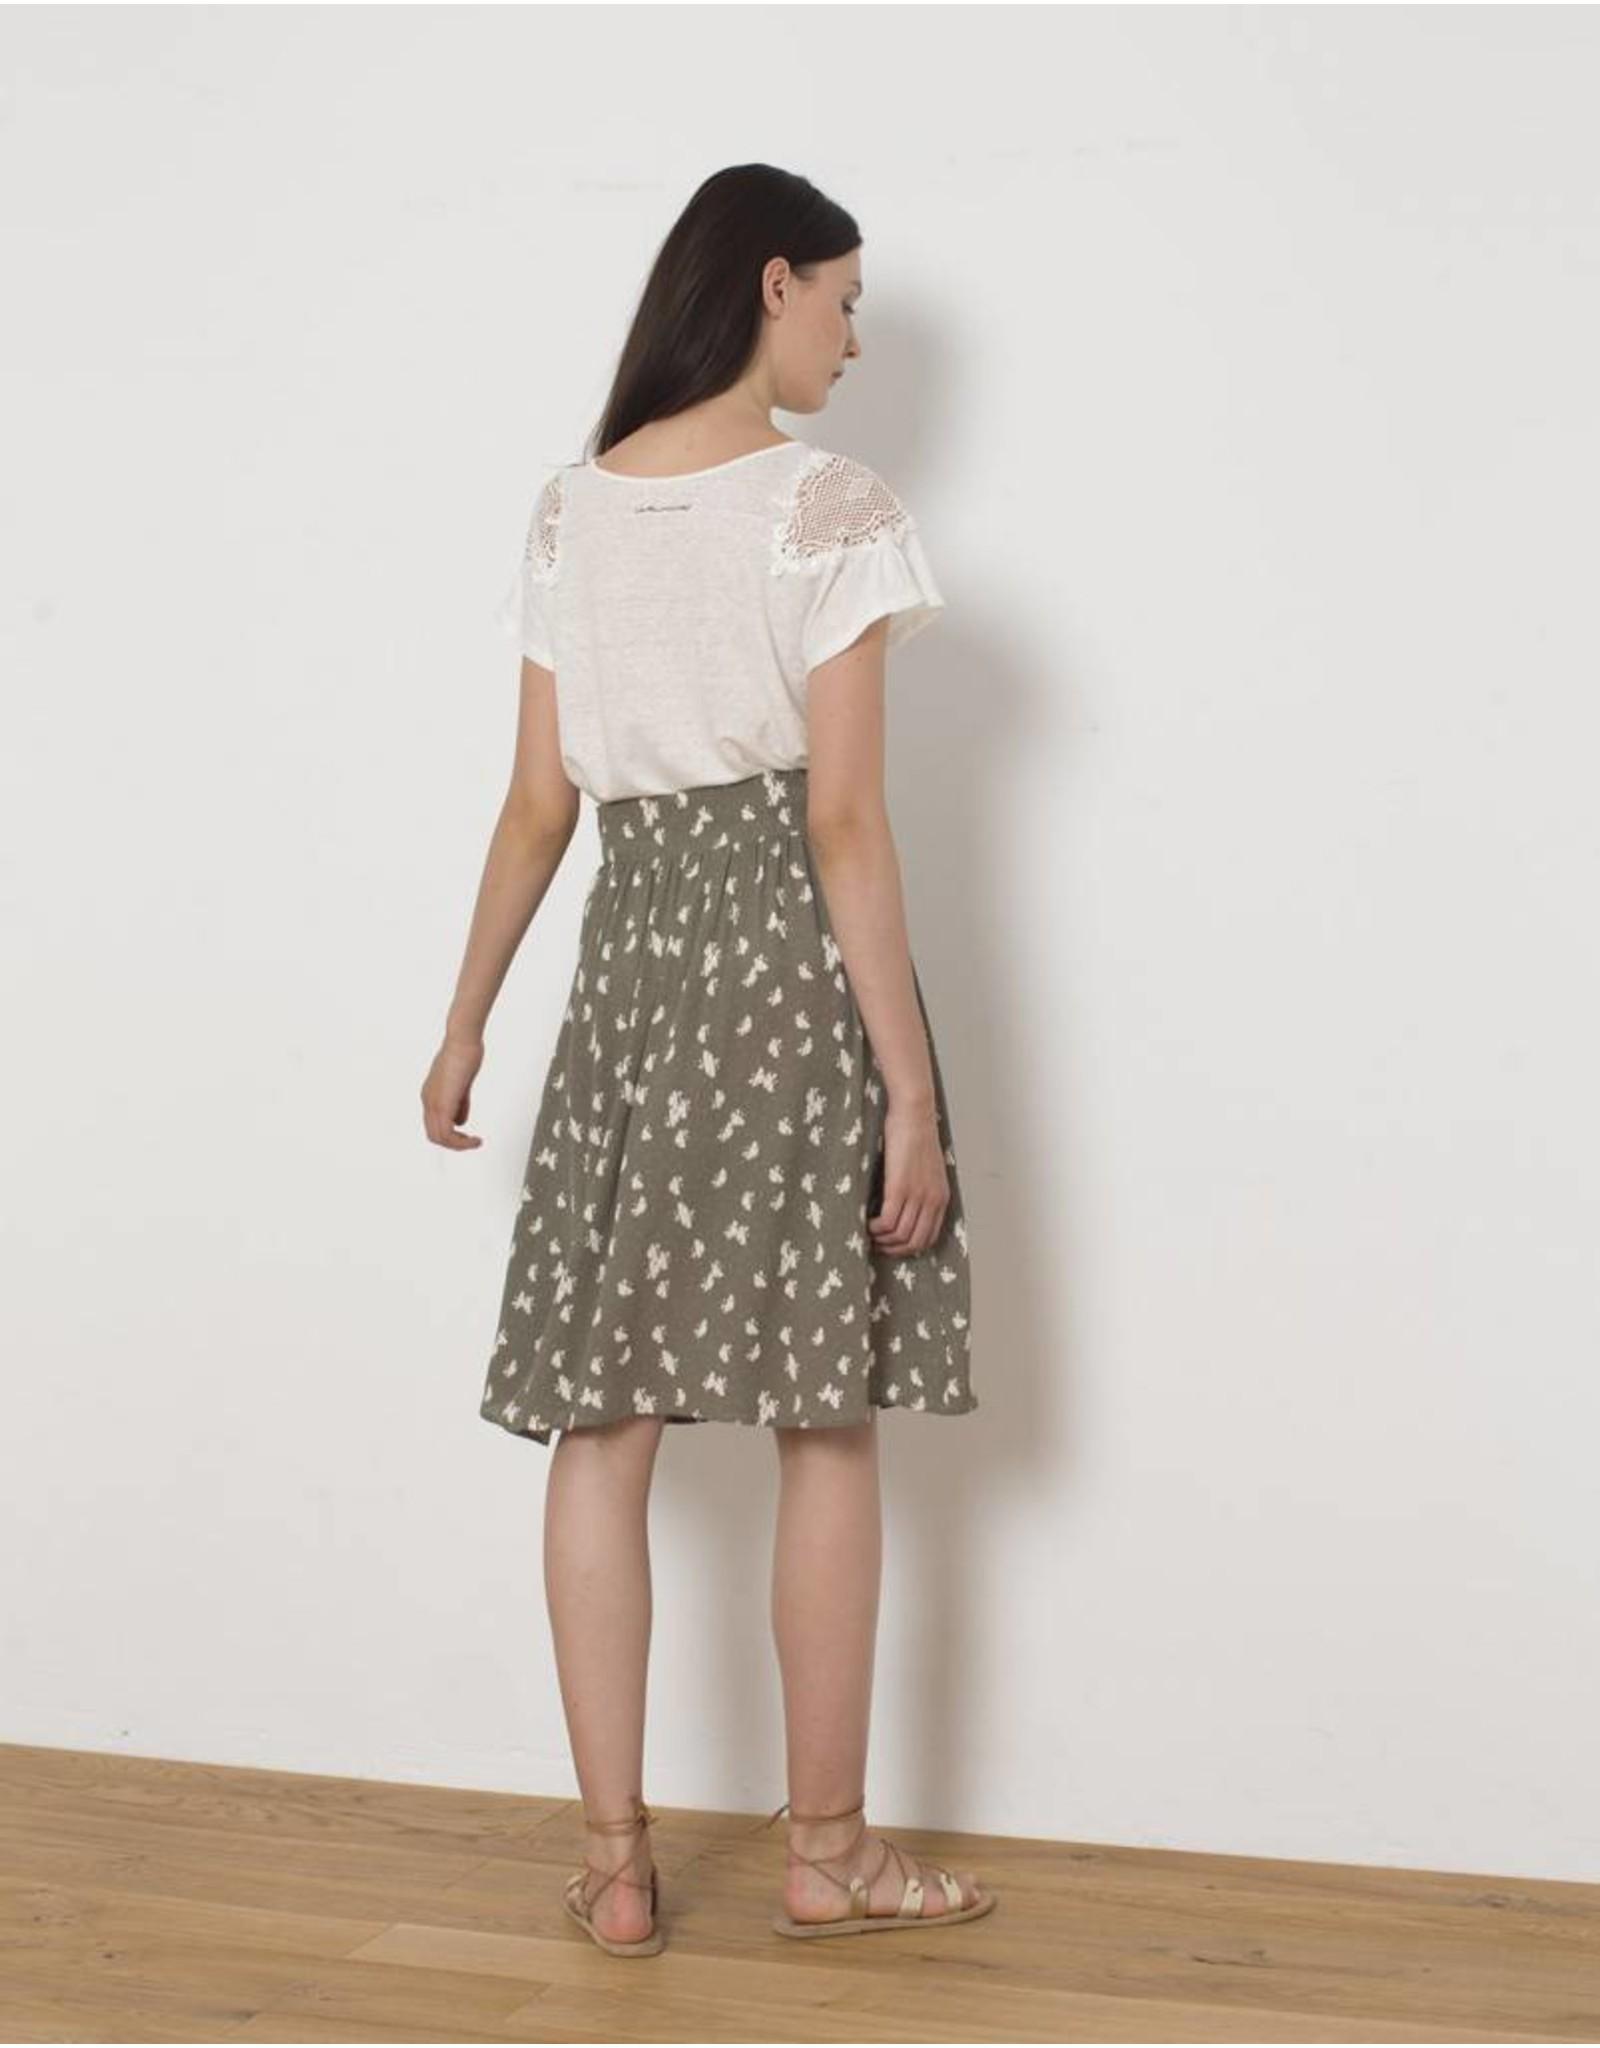 Sita Murt Linen Lace T